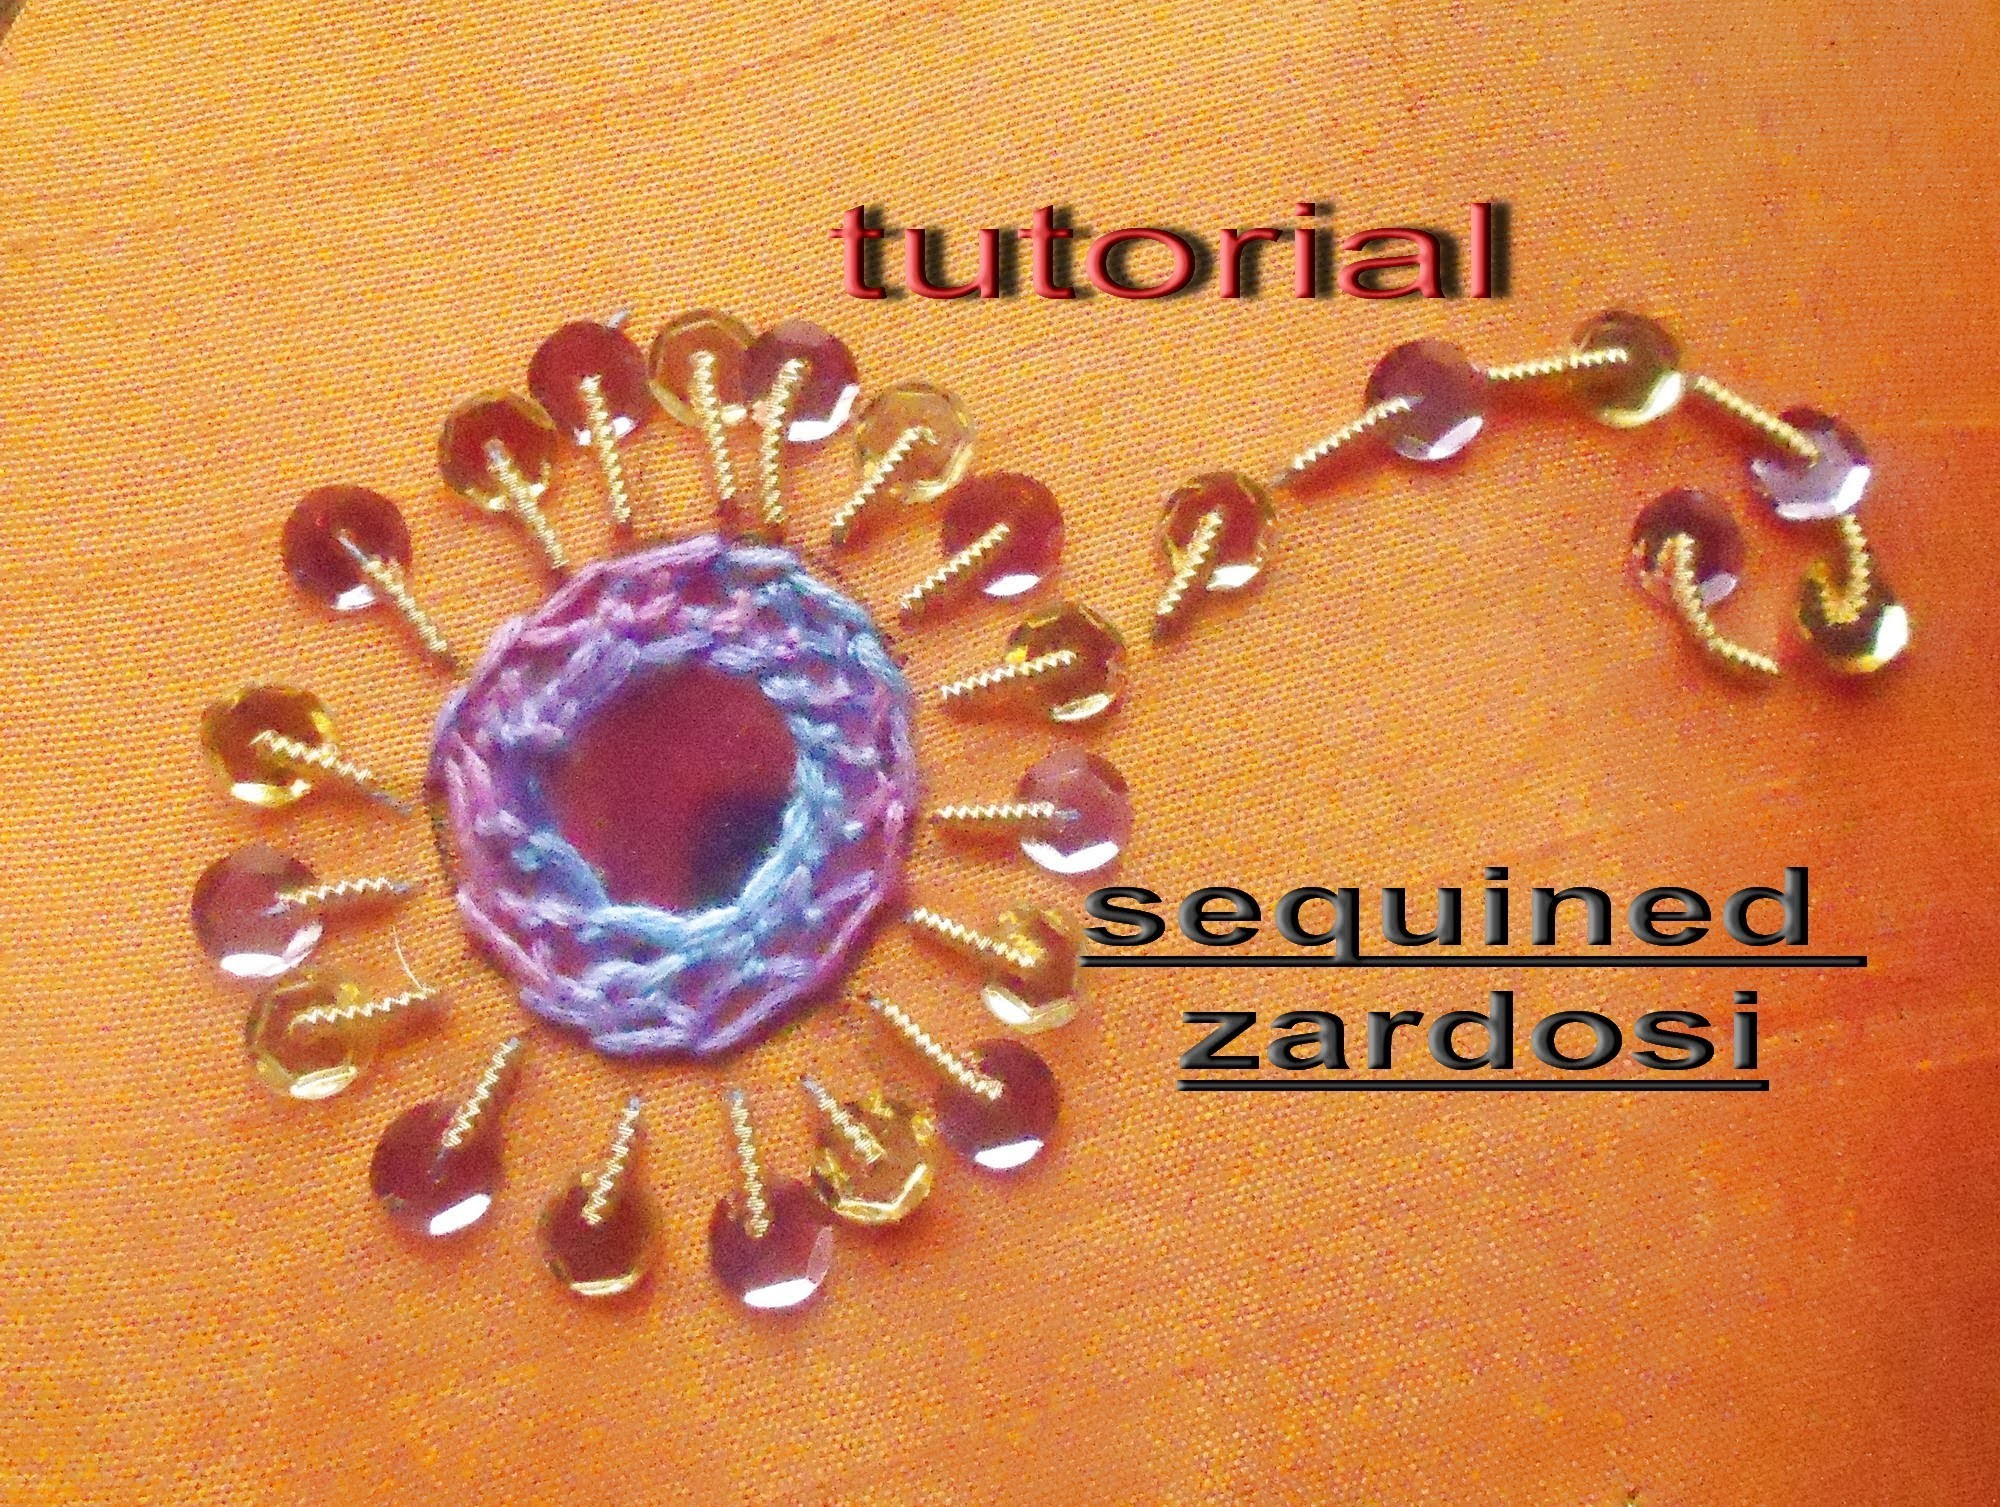 Hand embroidery: how to stitch Zardosi  around the shisha work